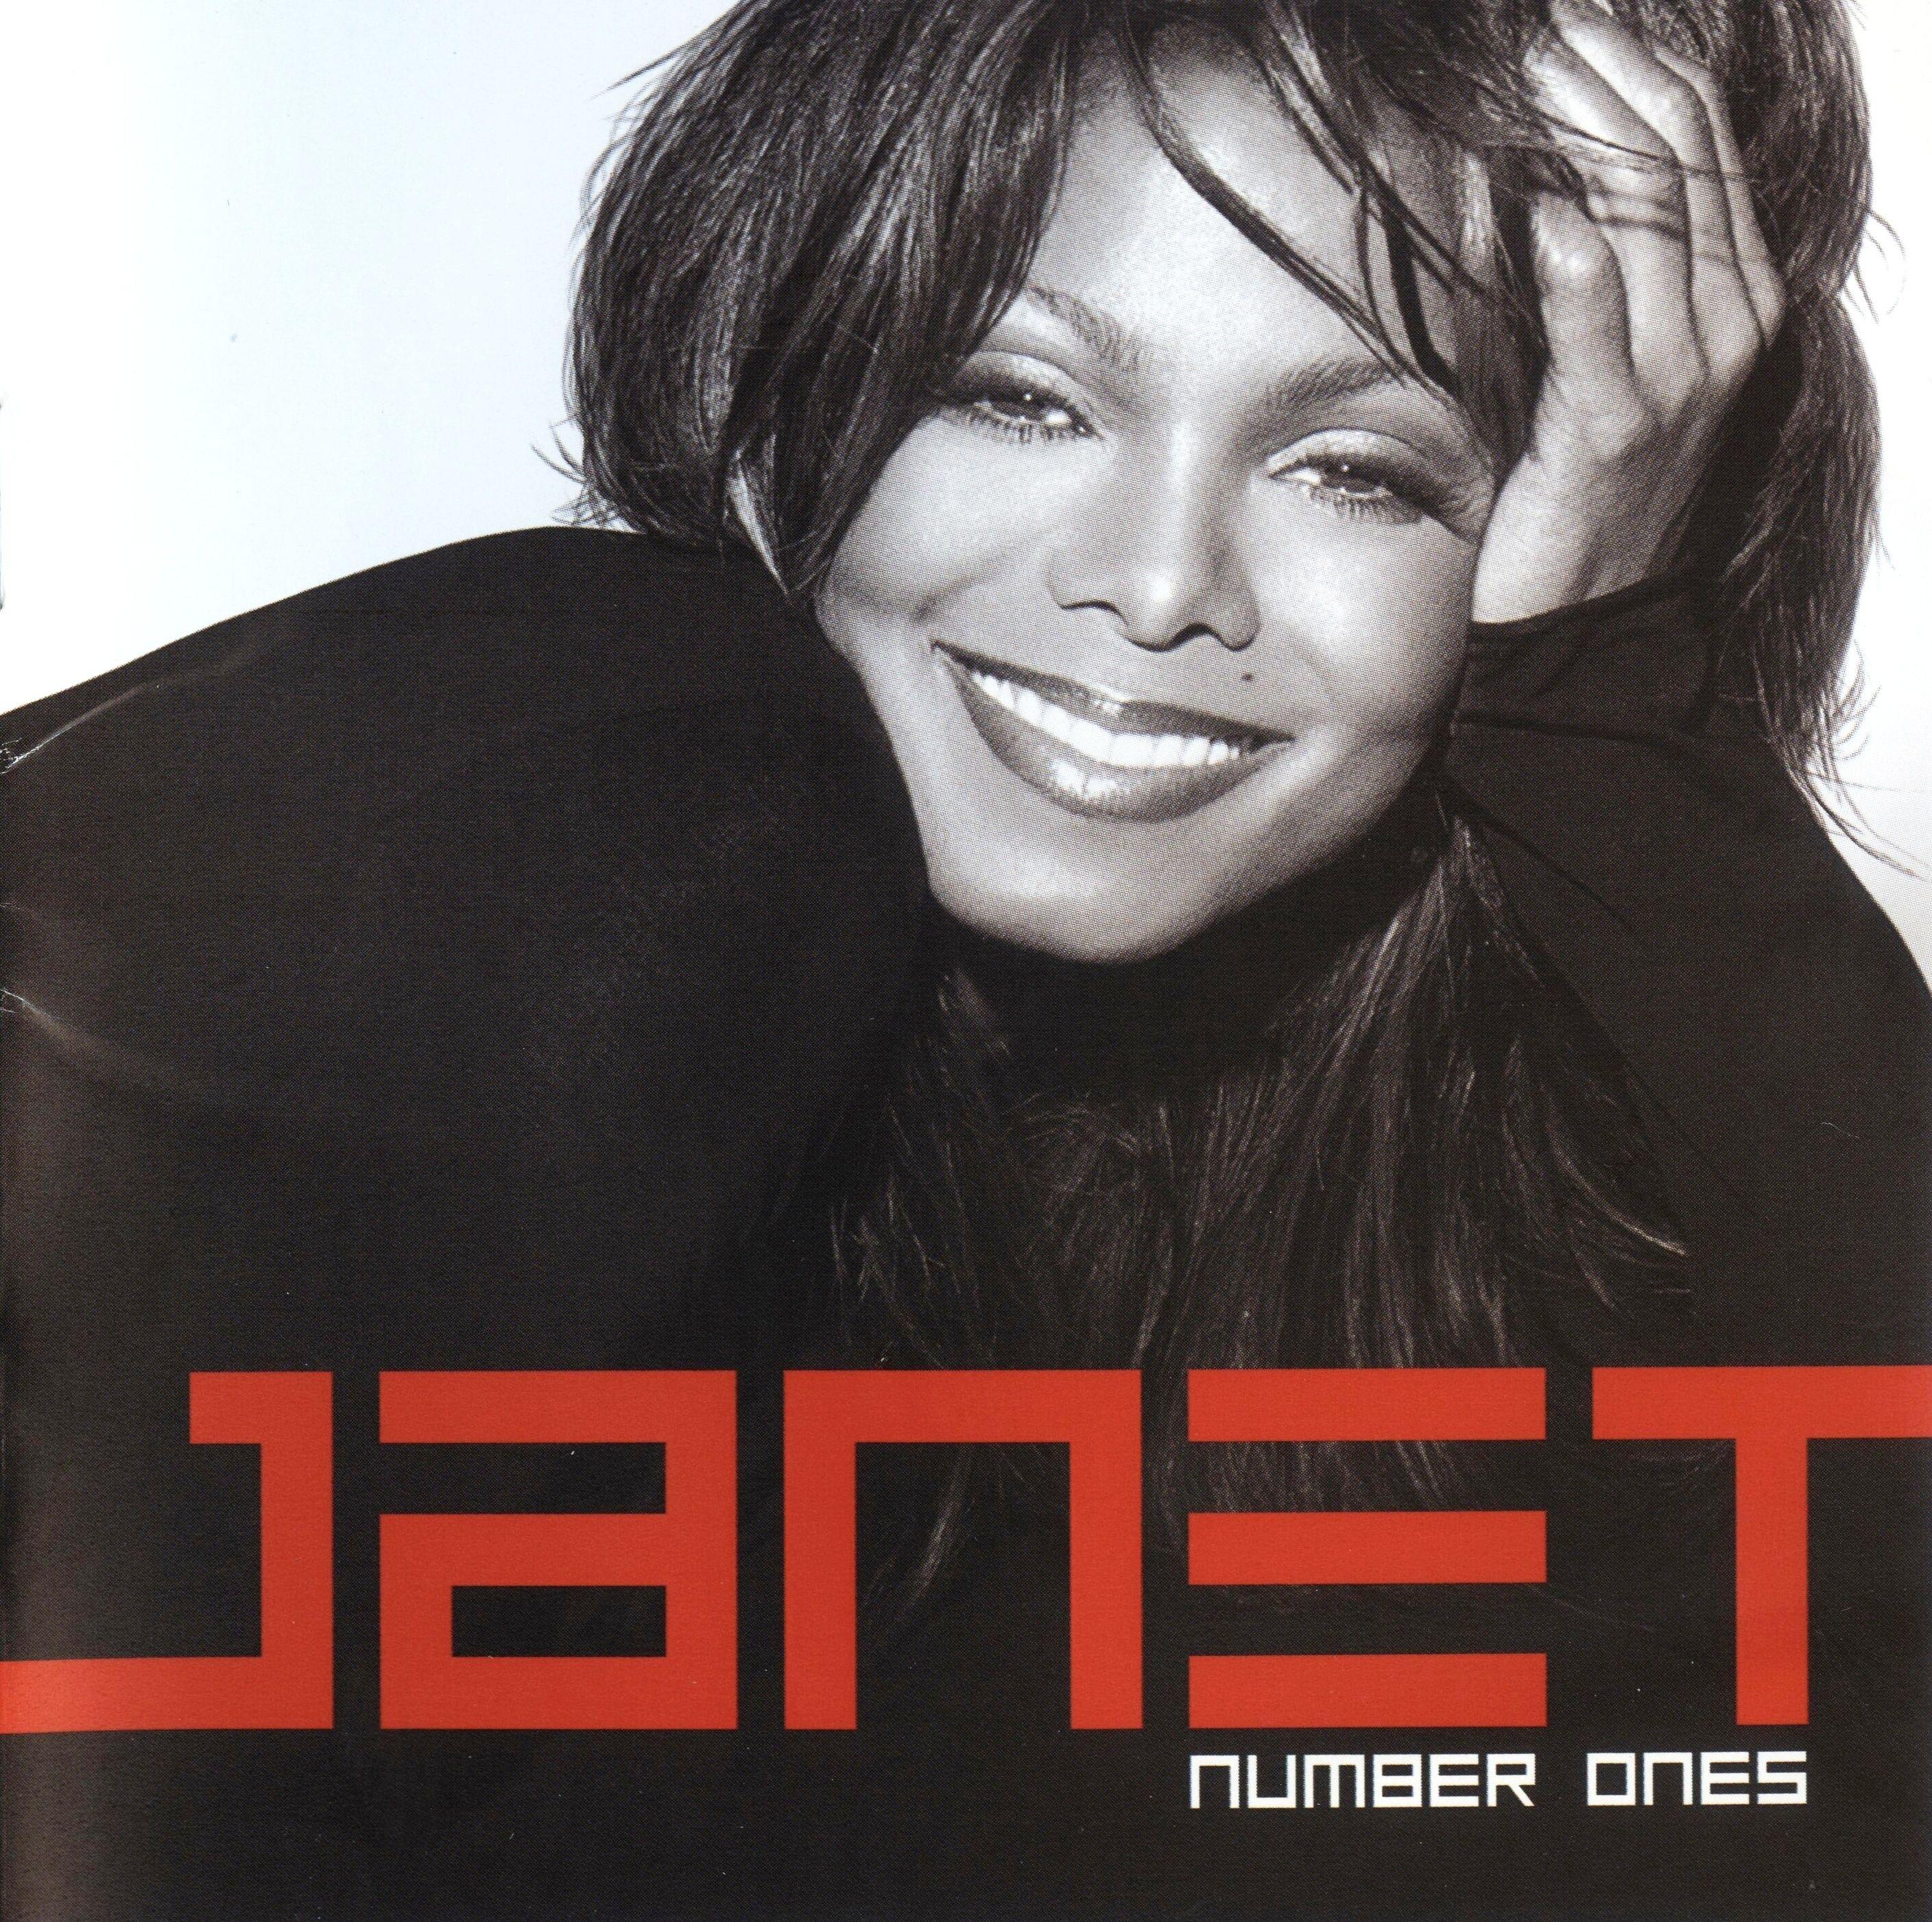 Janet Jackson - Number Ones album cover